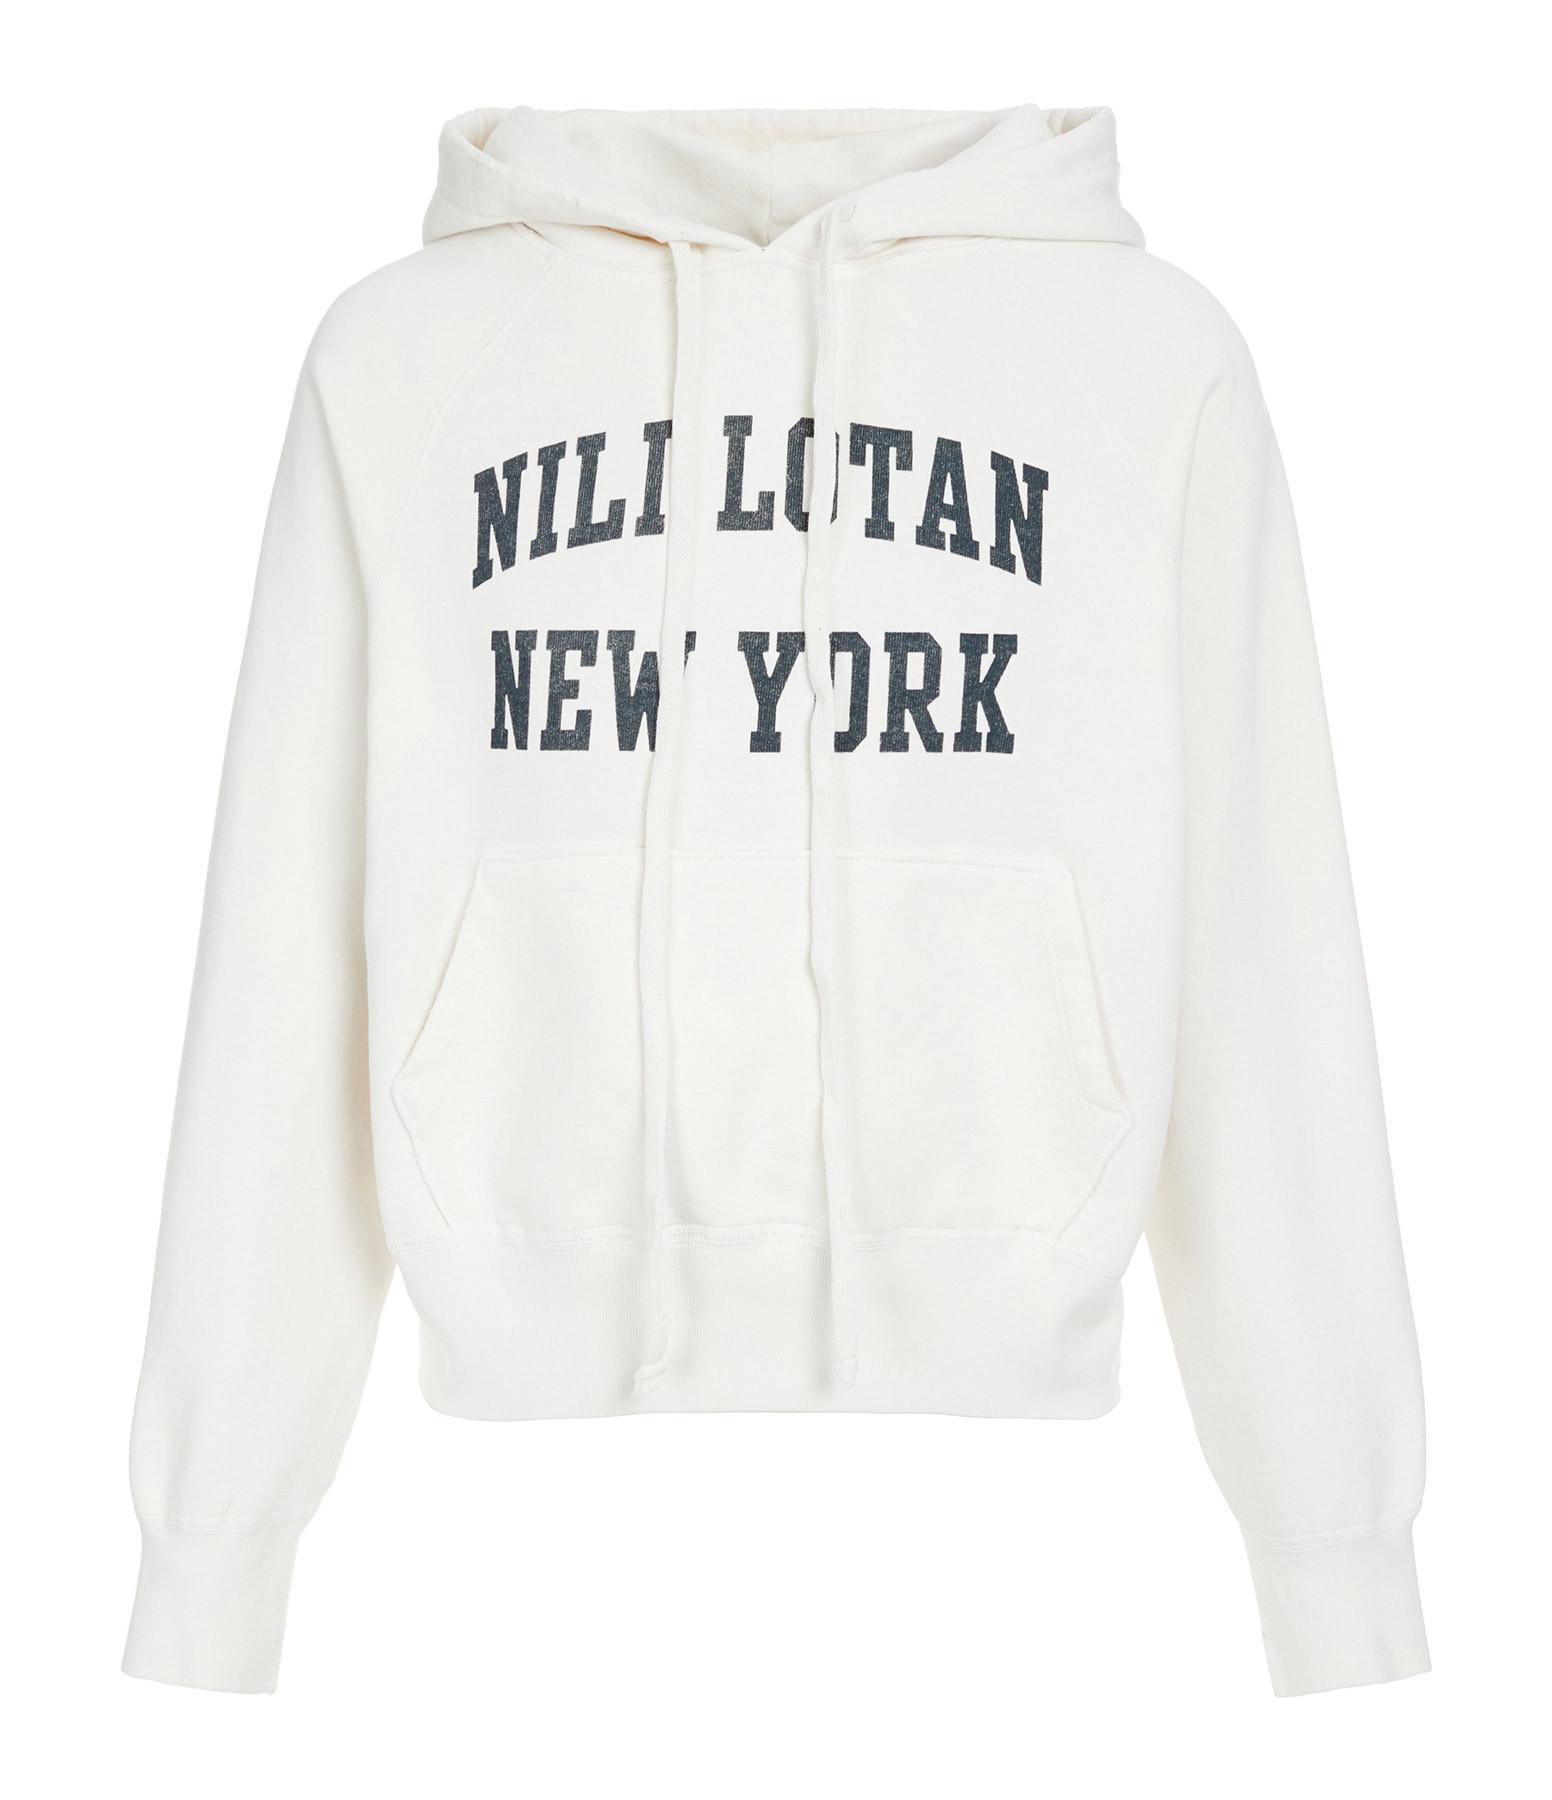 NILI LOTAN - Sweatshirt Nili Lotan New-York Imprimé Écru